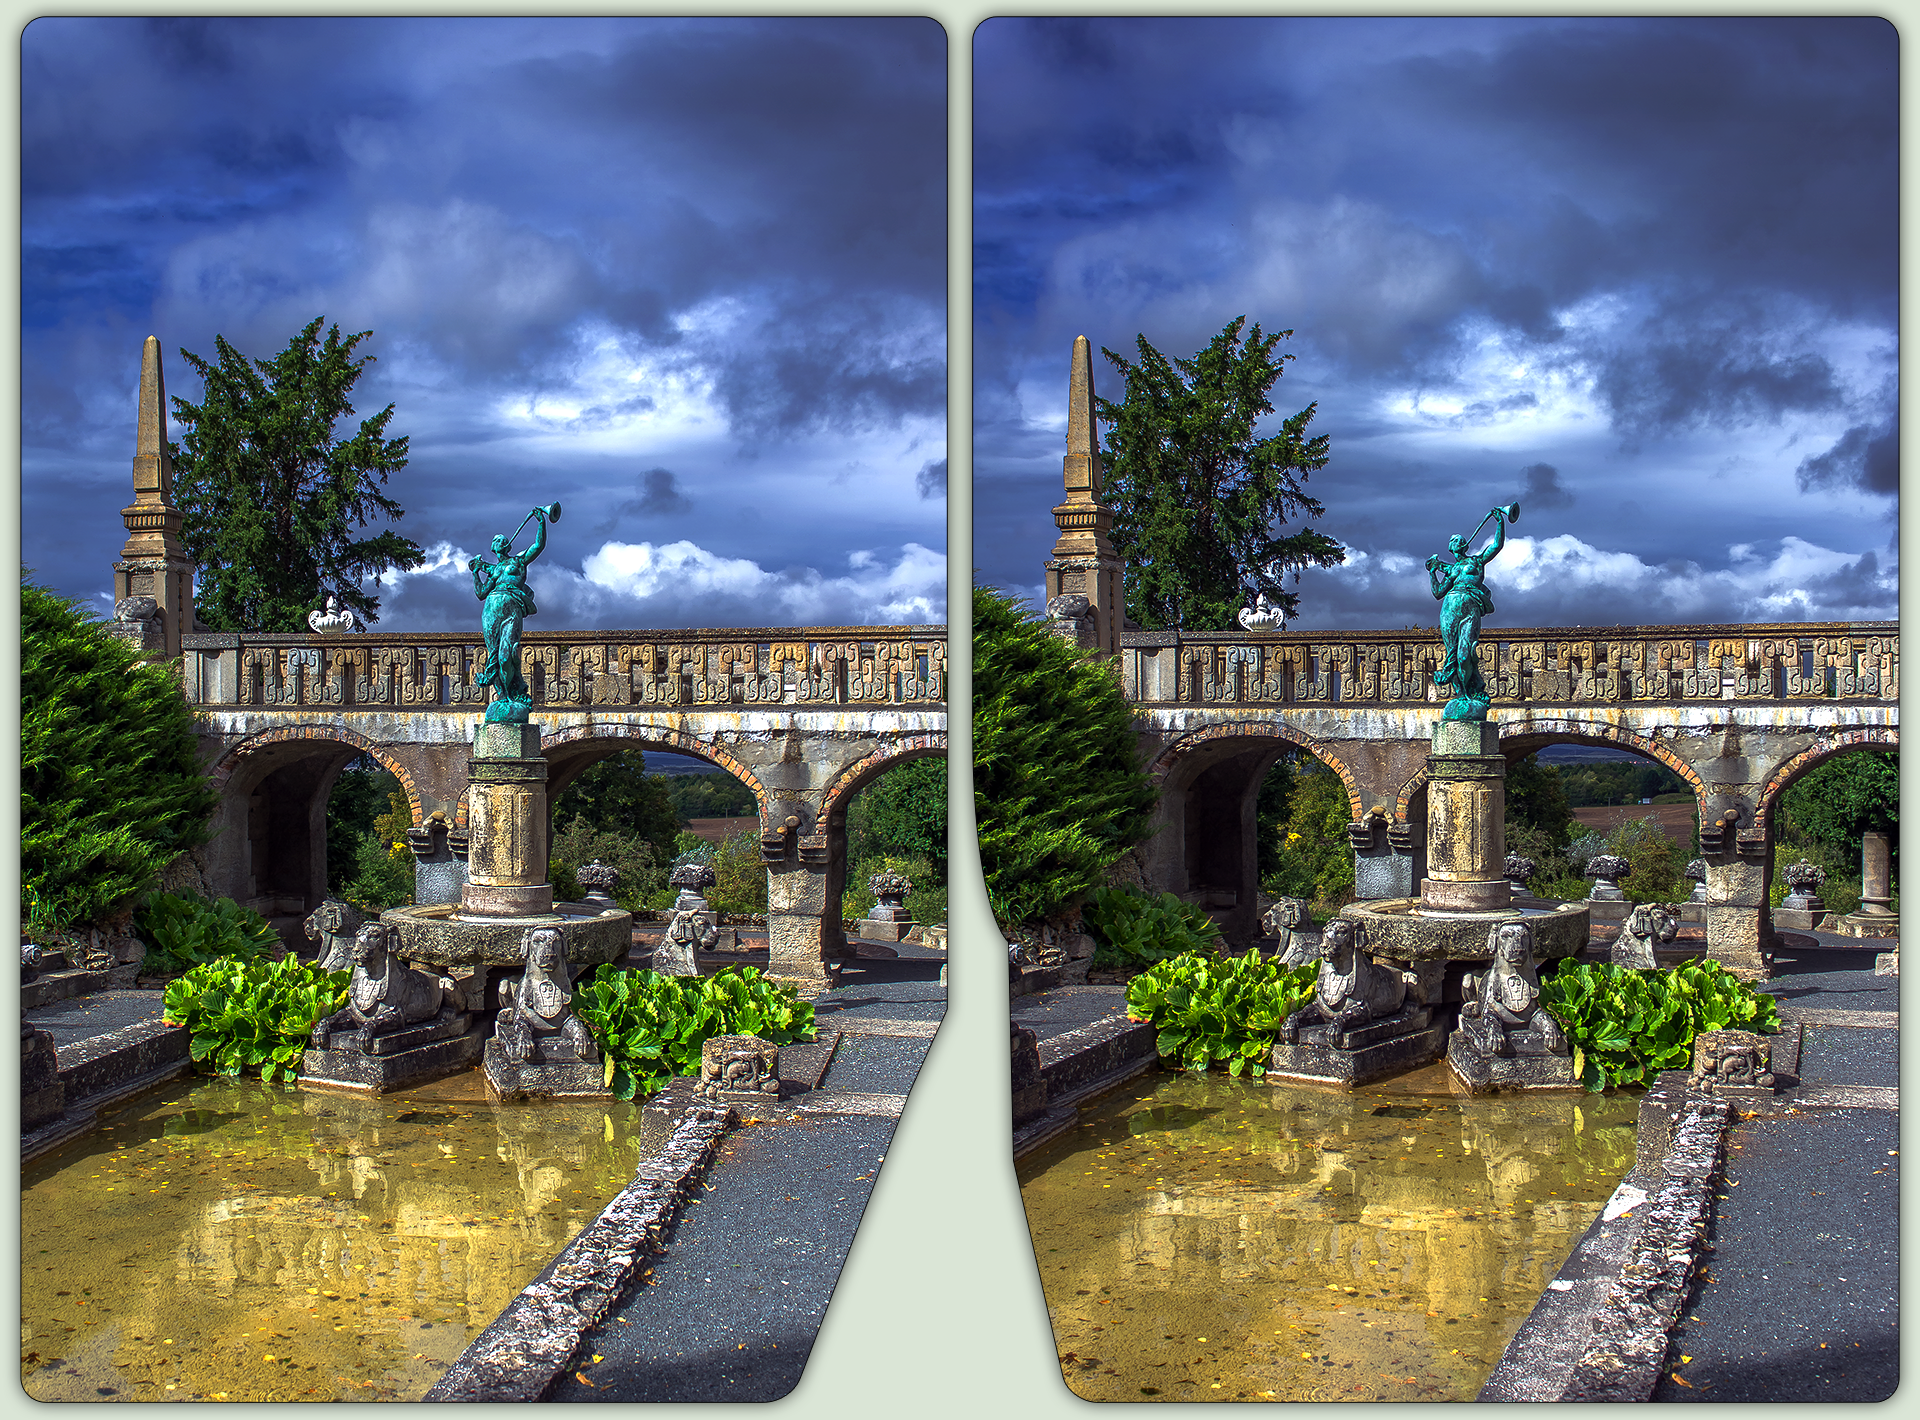 Romantic castle park 3-D / CrossEye / Stereoscopy by zour